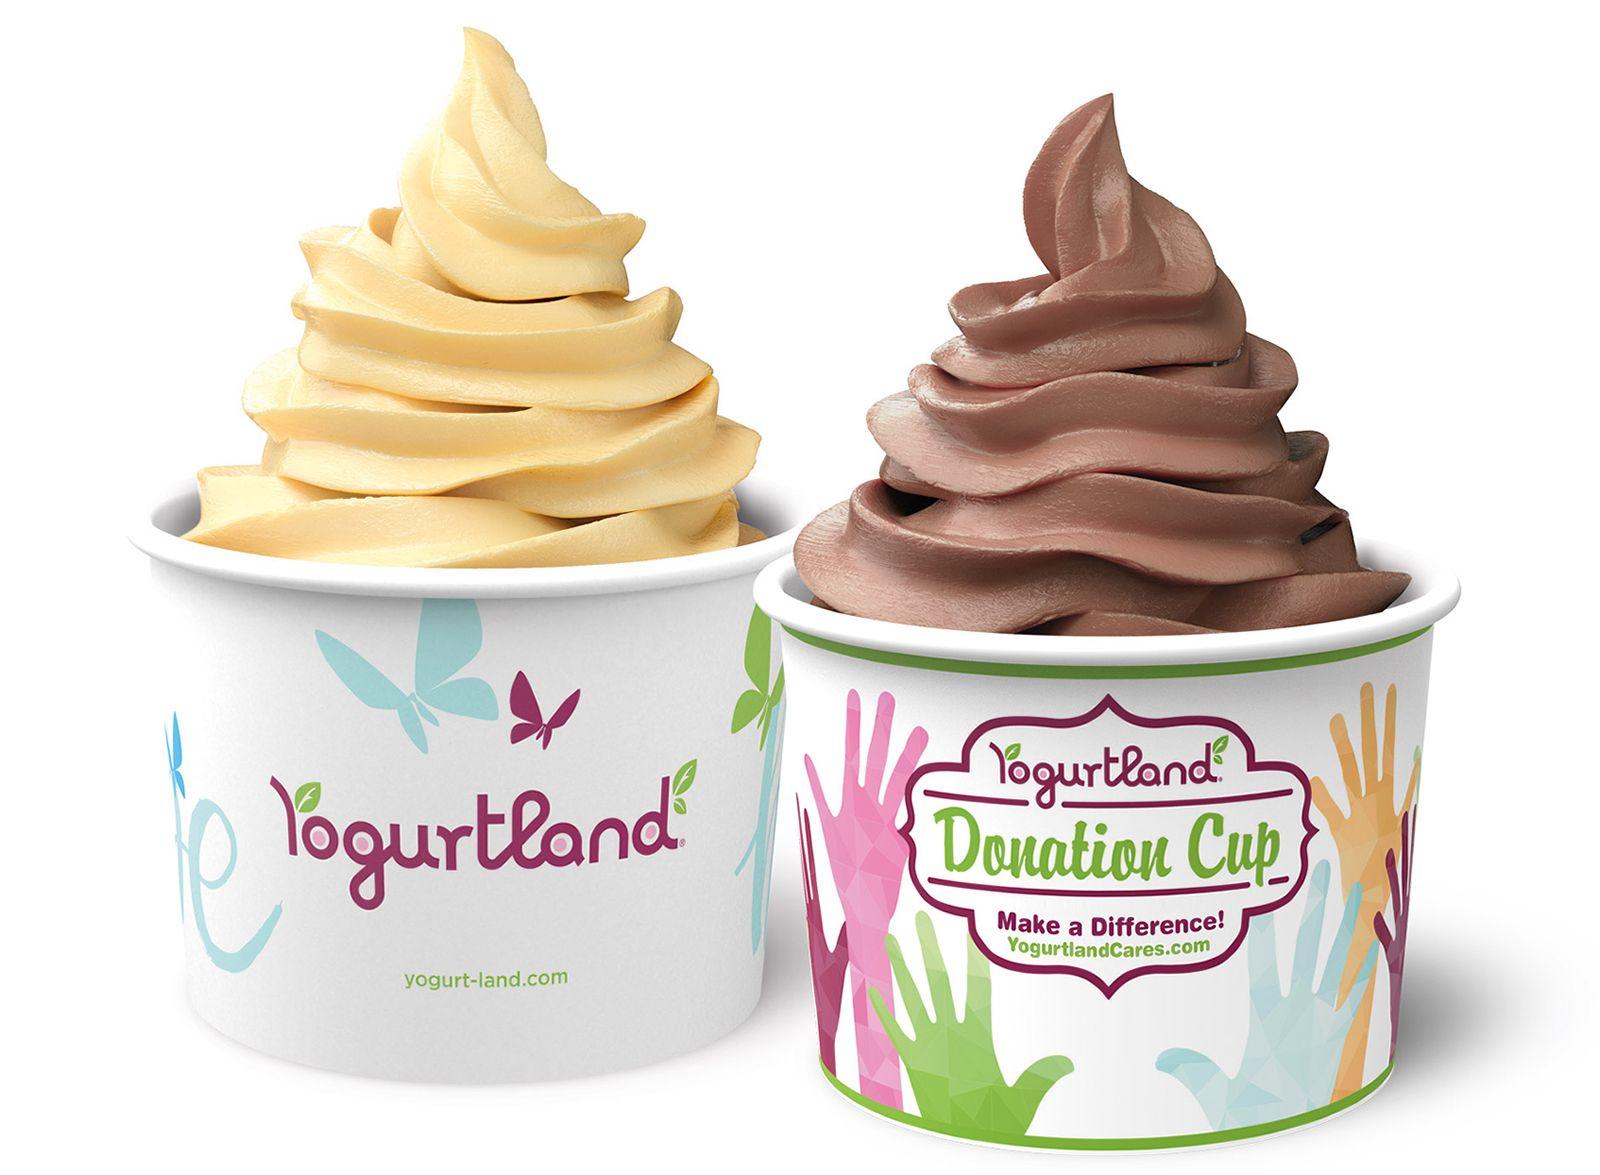 Yogurtland's 'Hope' Donation Cup Raises More Than $81,000 Supporting Yogurtland Cares Charities